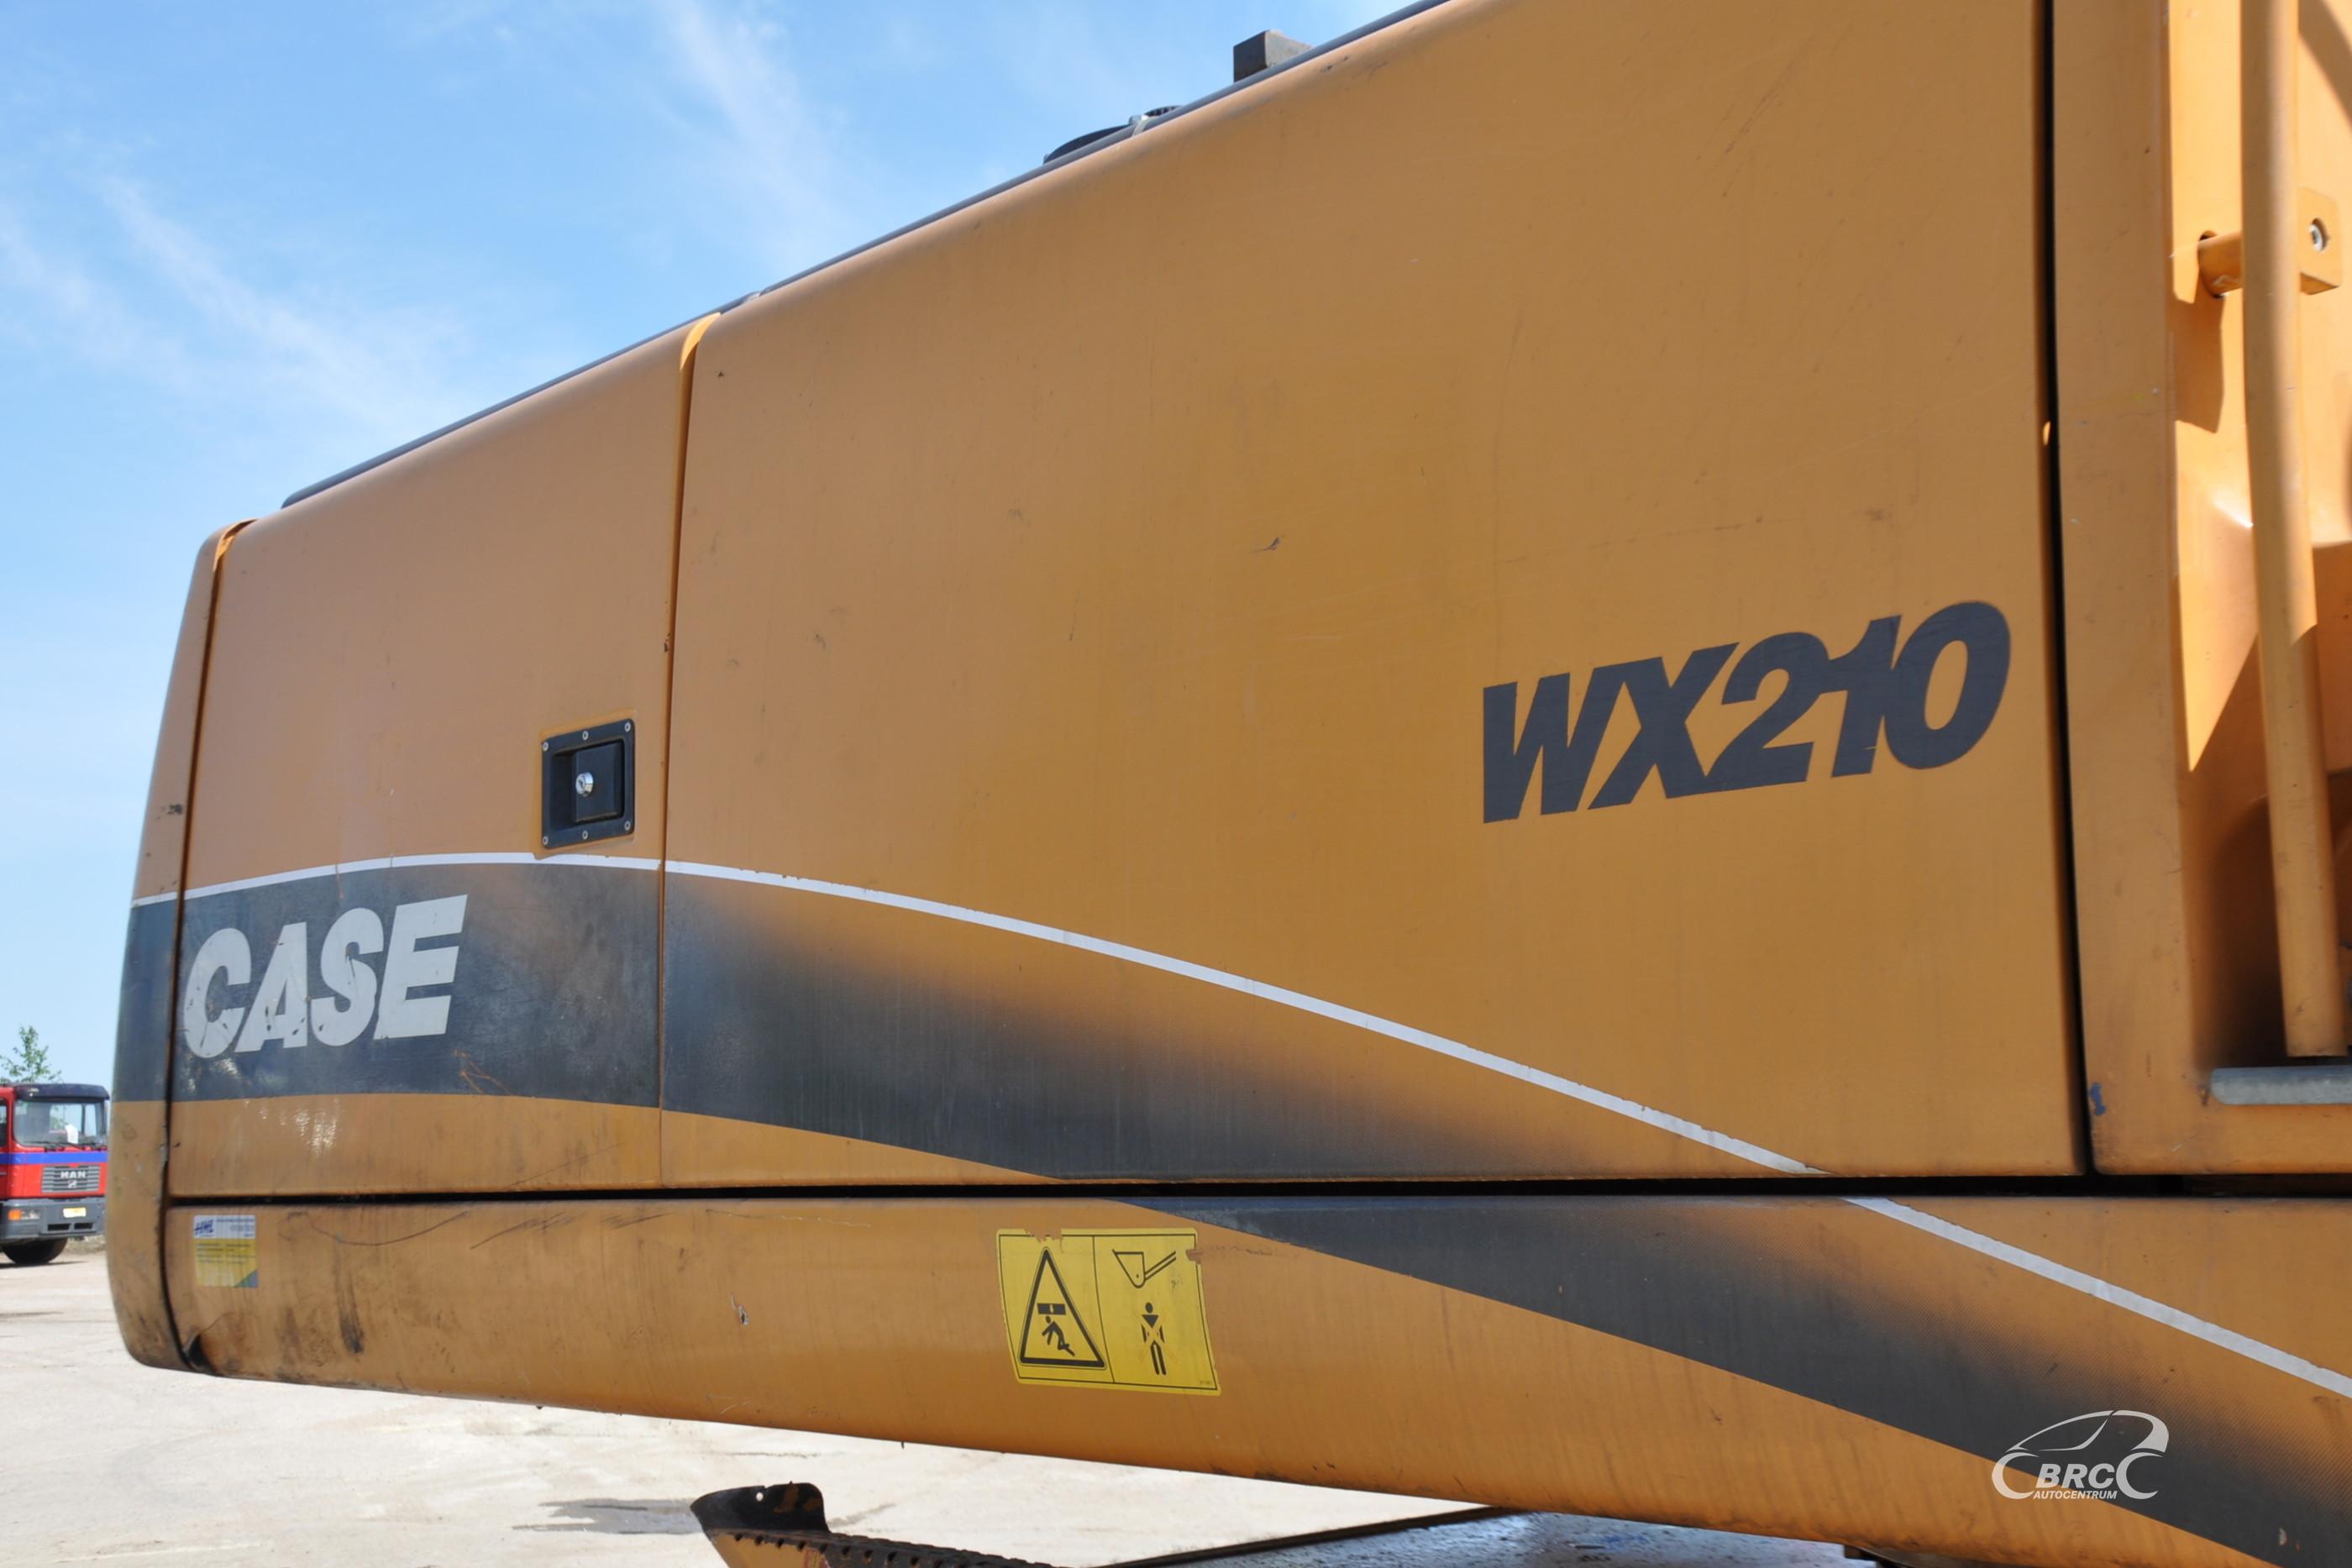 Case WX 210